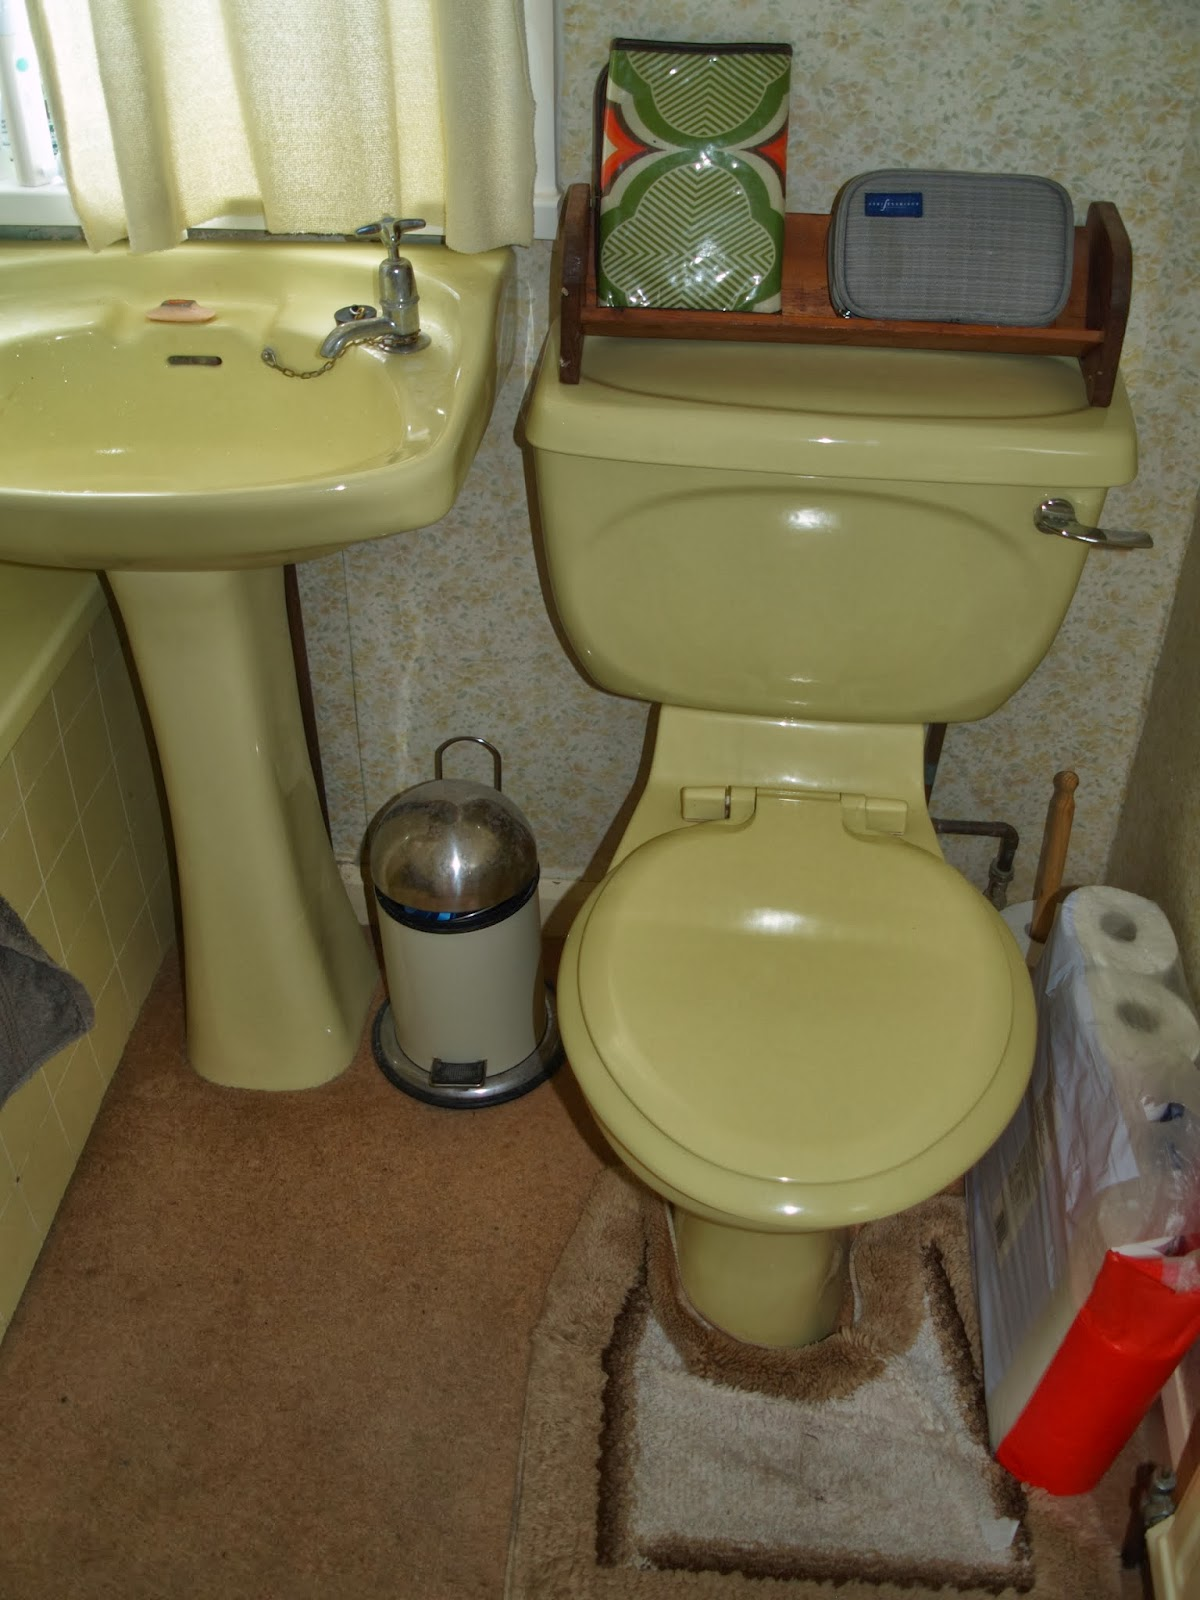 The Horfield House Old Bathroom